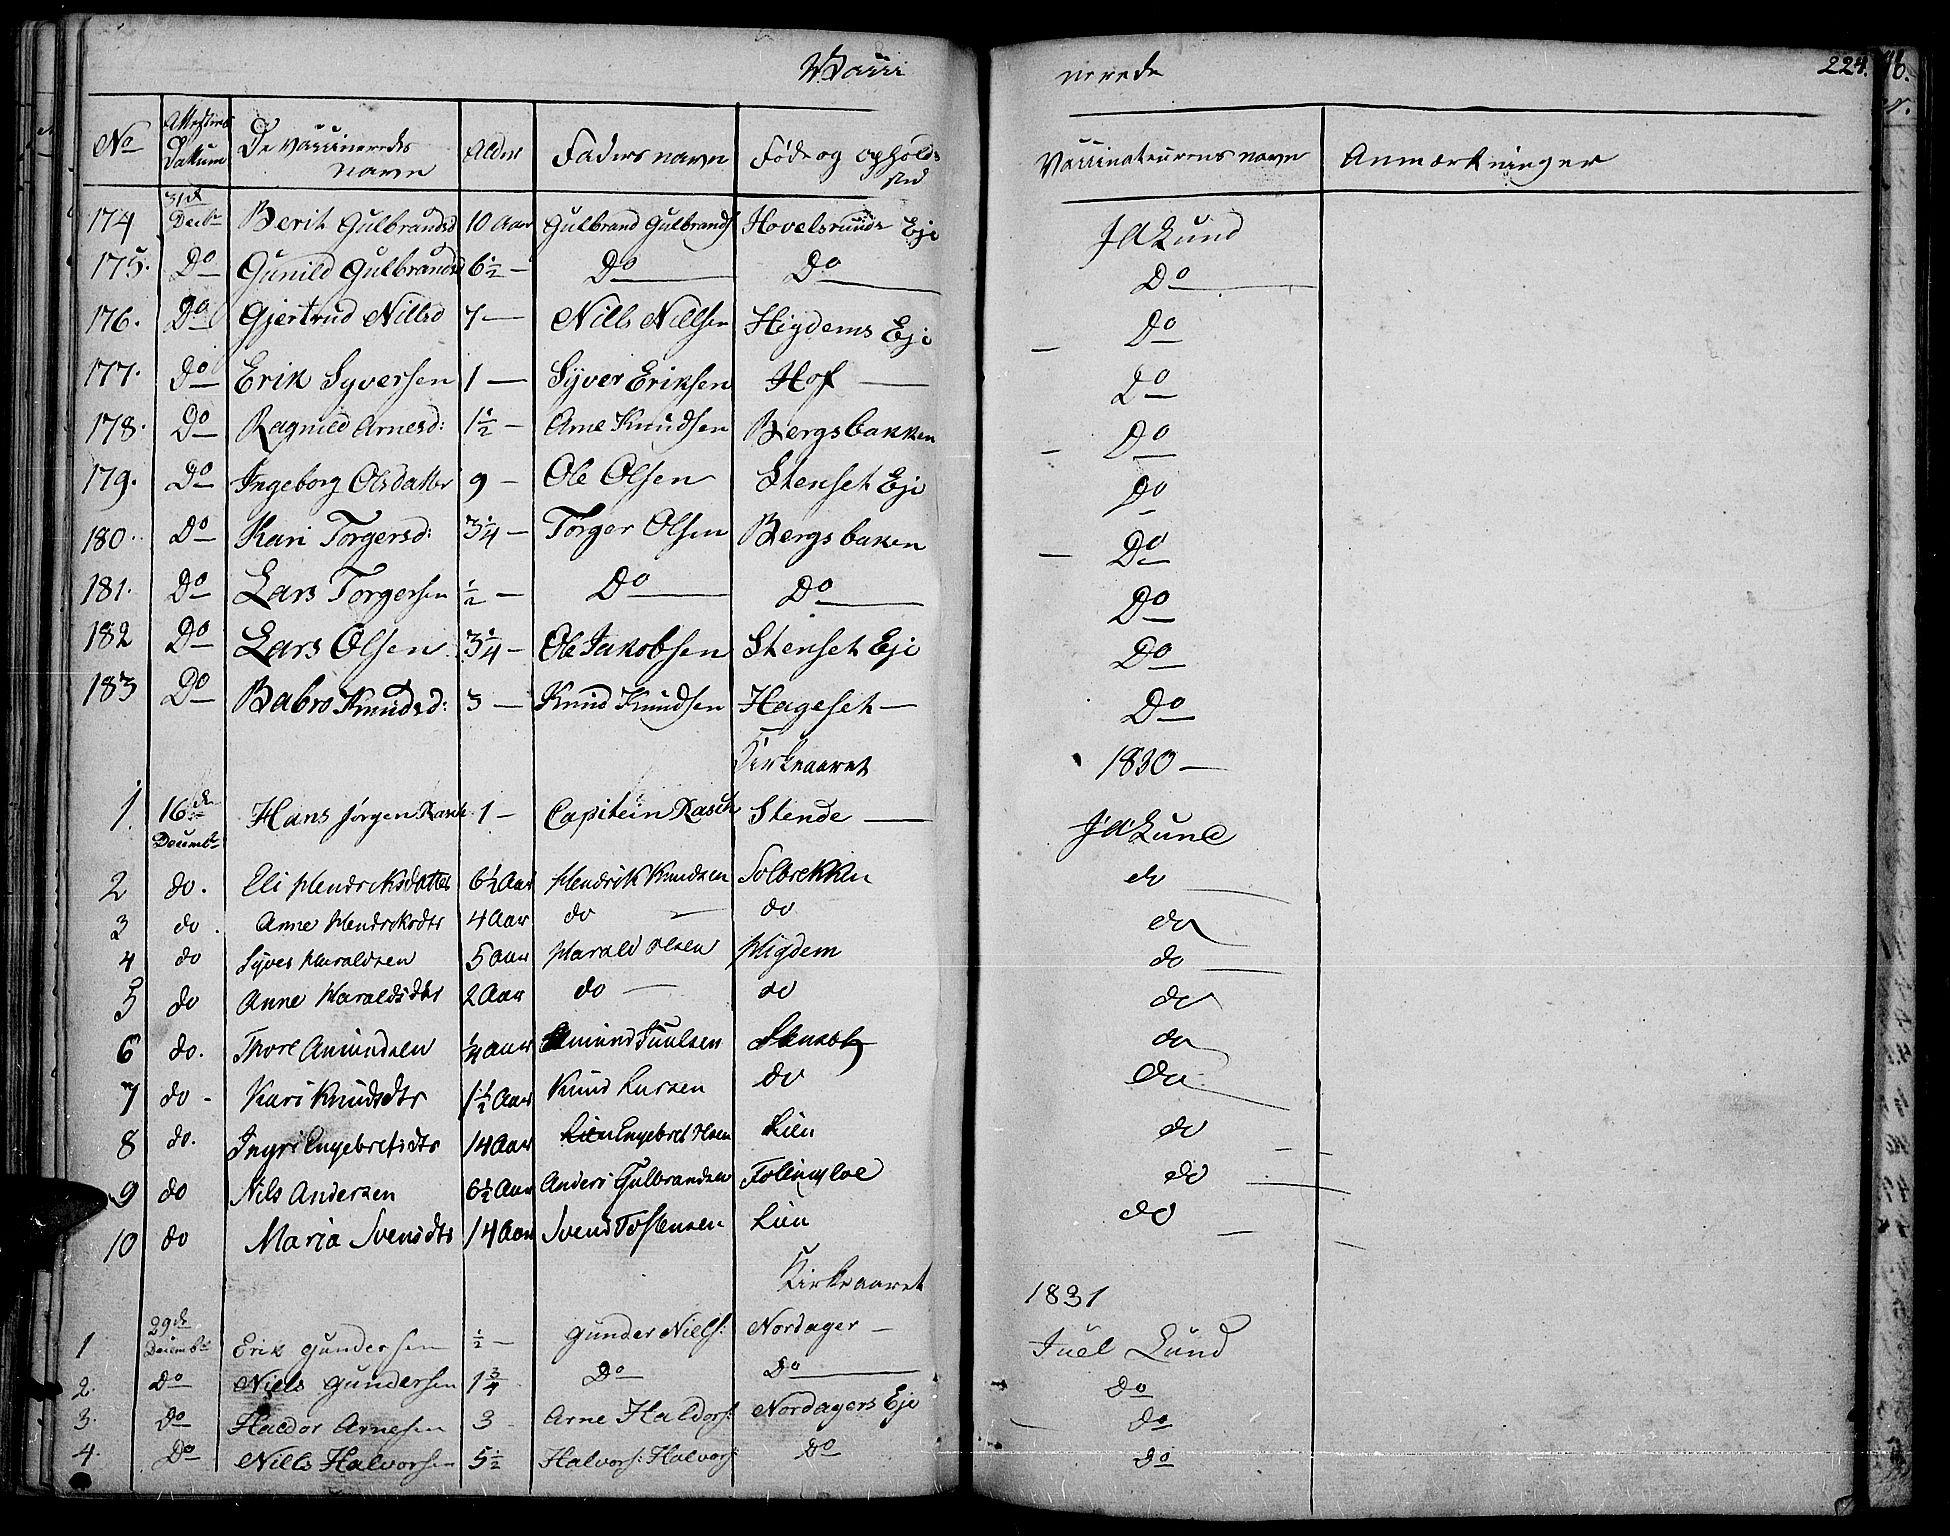 SAH, Nord-Aurdal prestekontor, Ministerialbok nr. 3, 1828-1841, s. 224